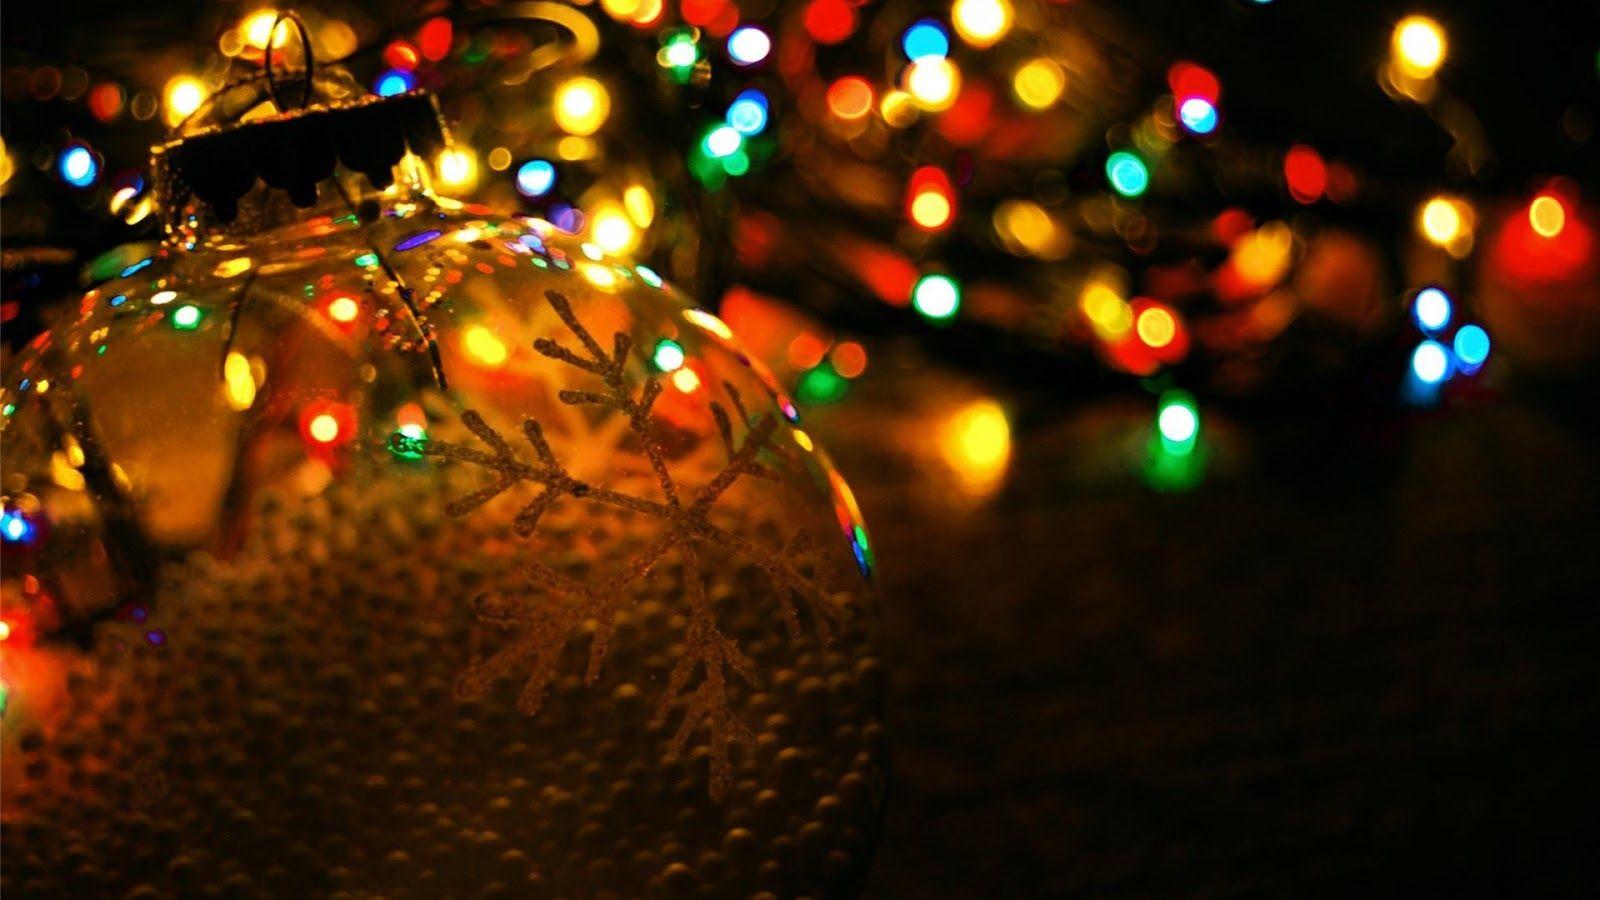 Odyssey Oklahoma Merrychristmas Holiday Https Www Theodysseyonline Com Oklahoma Holi Christmas Desktop Christmas Desktop Wallpaper Christmas Wallpaper Hd